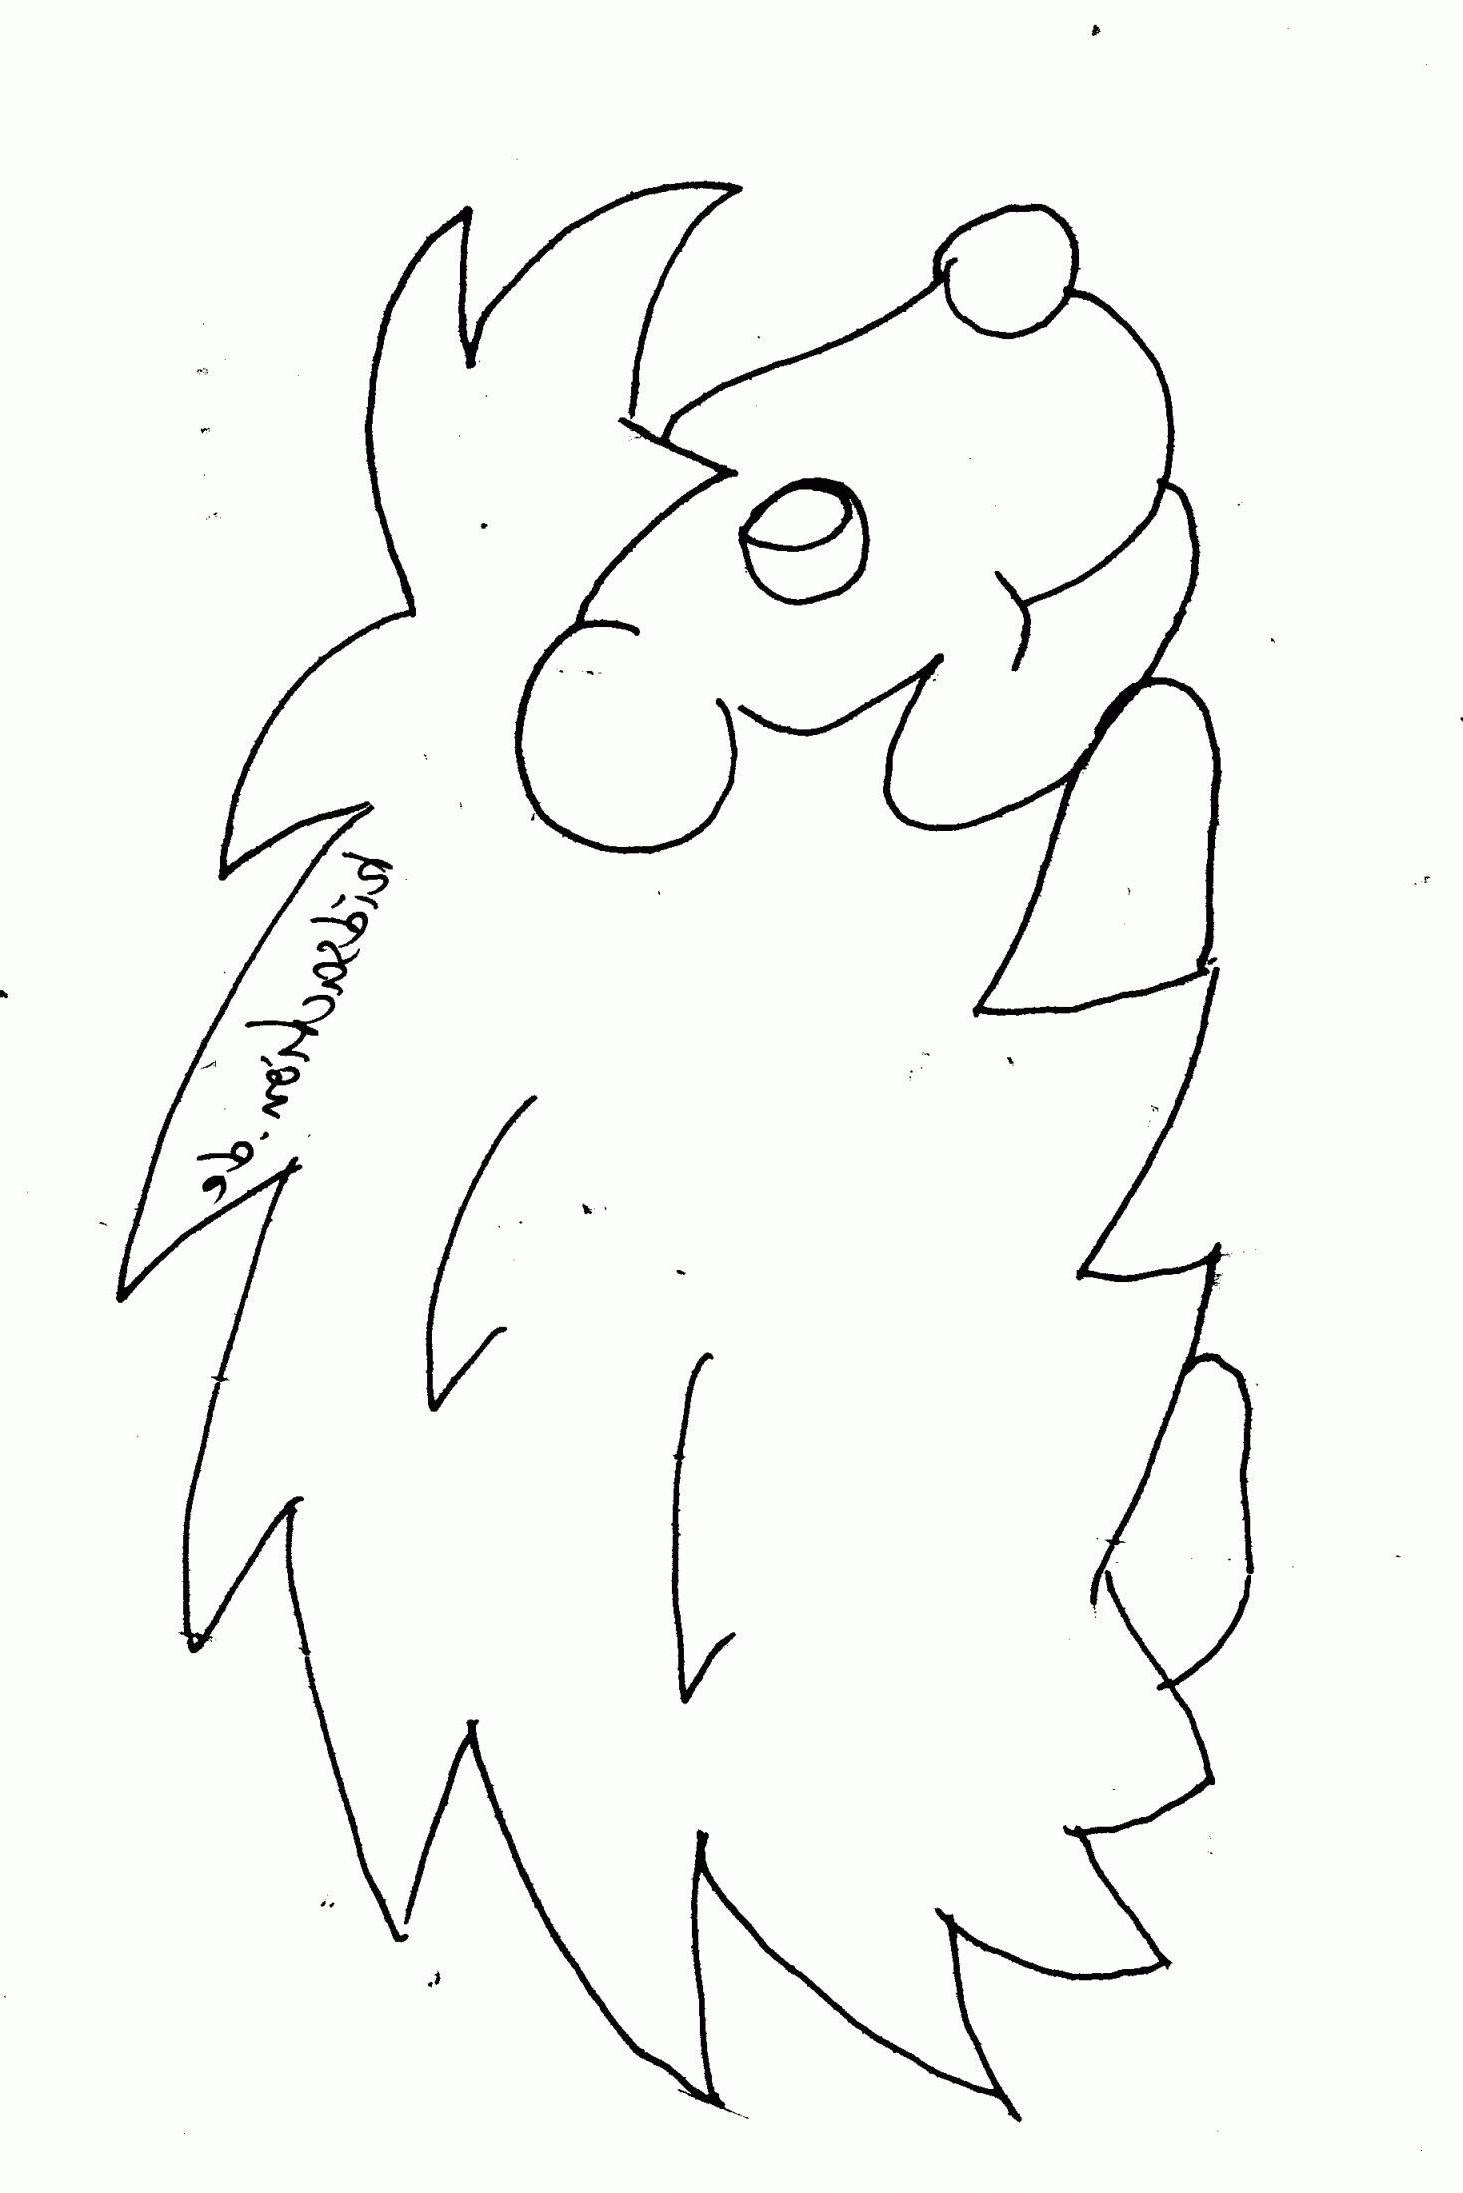 Ausmalbilder Meerjungfrau H2o Neu 35 Inspirierend Meerjungfrau Bilder Zum Ausmalen – Malvorlagen Ideen Das Bild